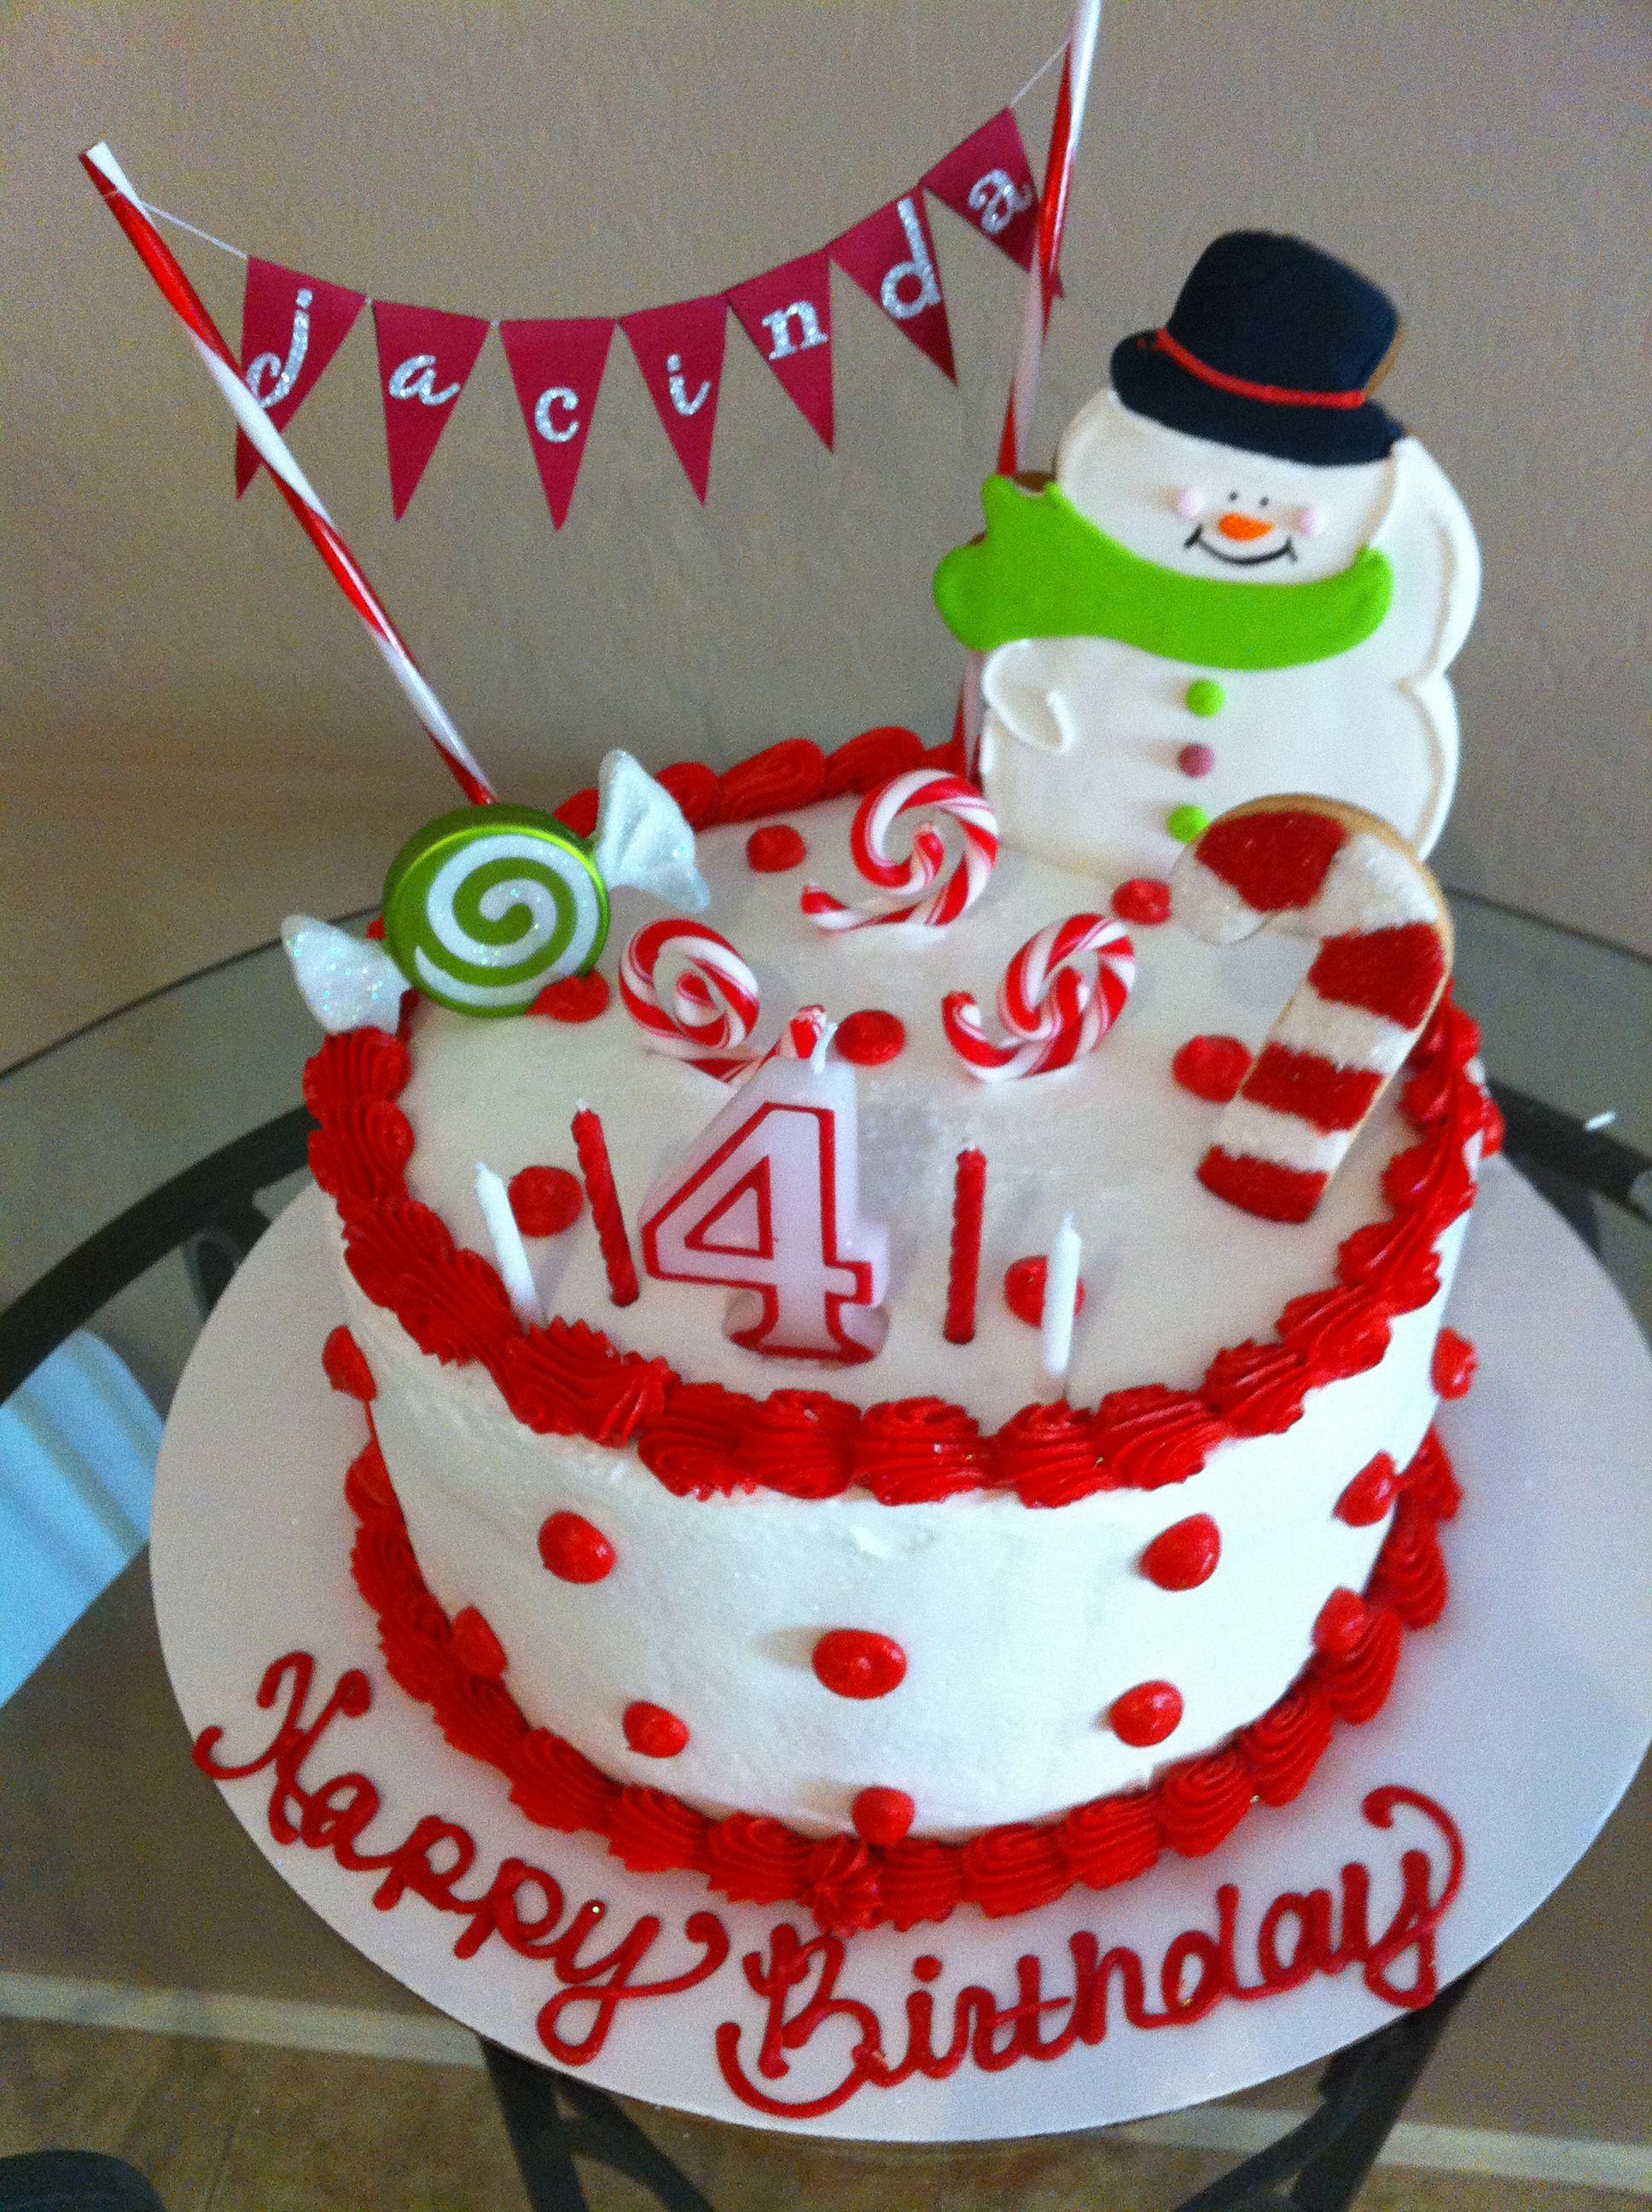 December Birthday Cake | Parties! | Pinterest | December ...